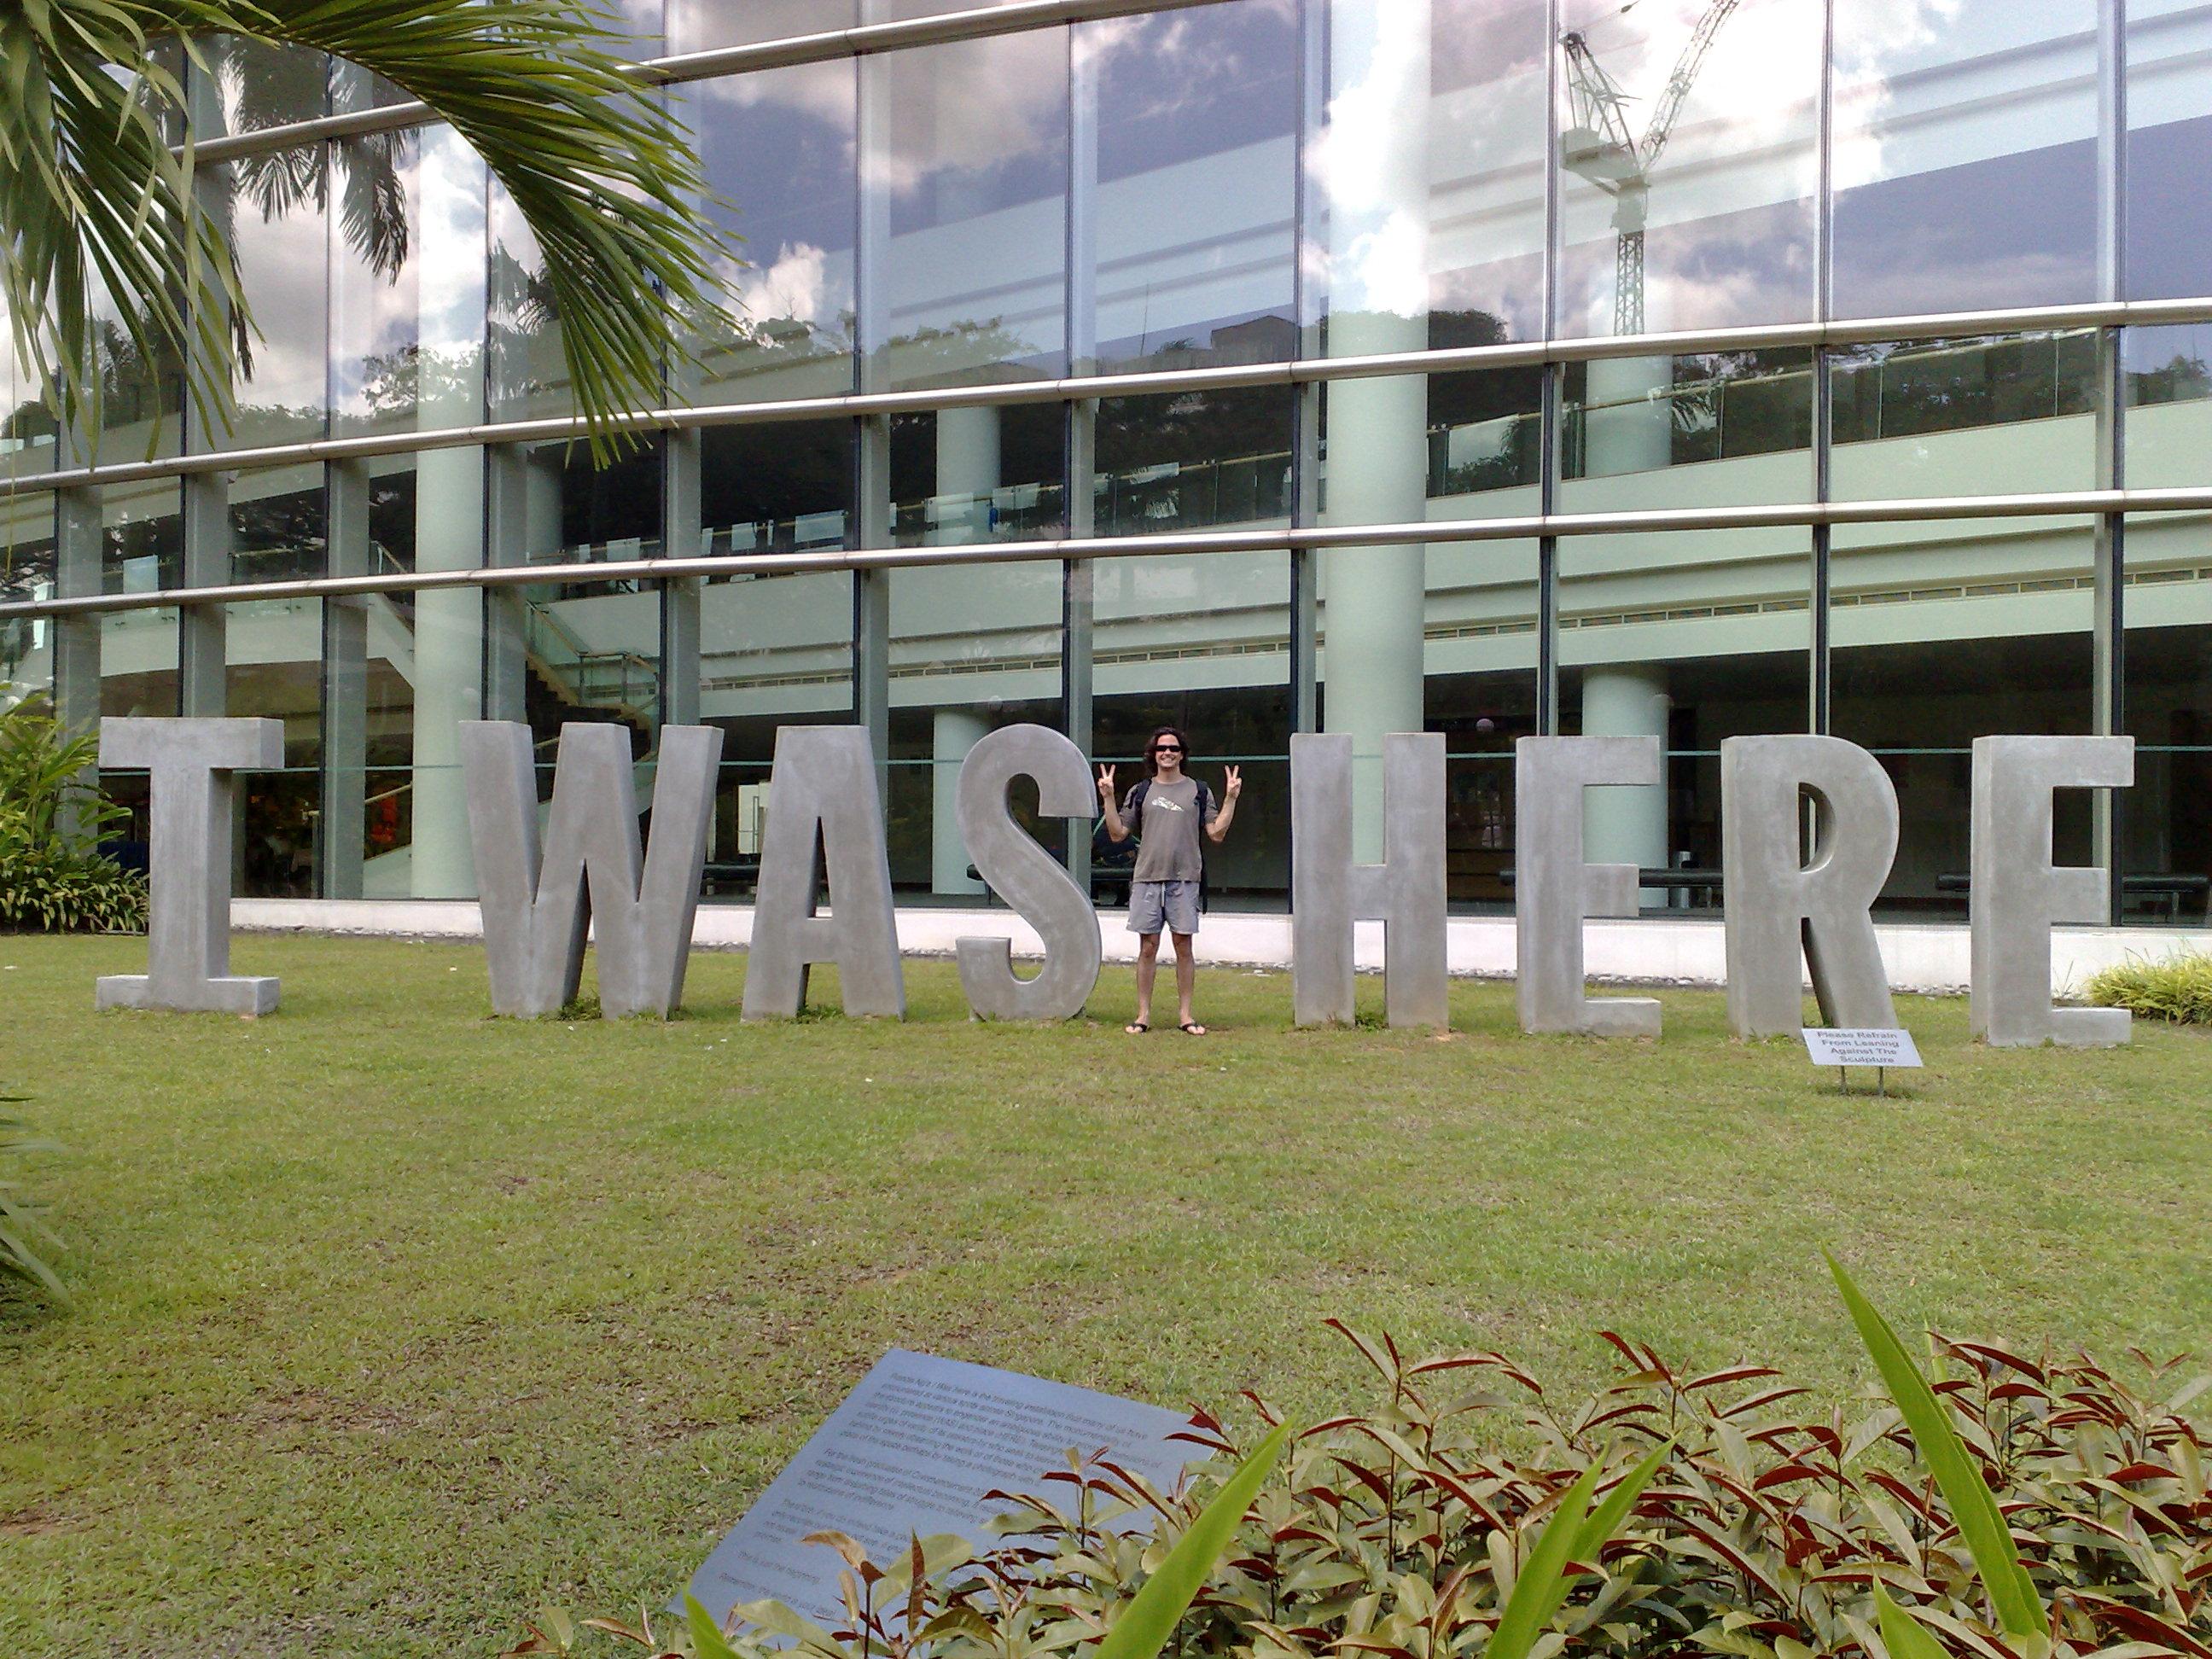 national university of singapore essay College essay advisors 136,876 views 3:05 life at national university of singapore - postgraduate degree experience by neha wadhwa.